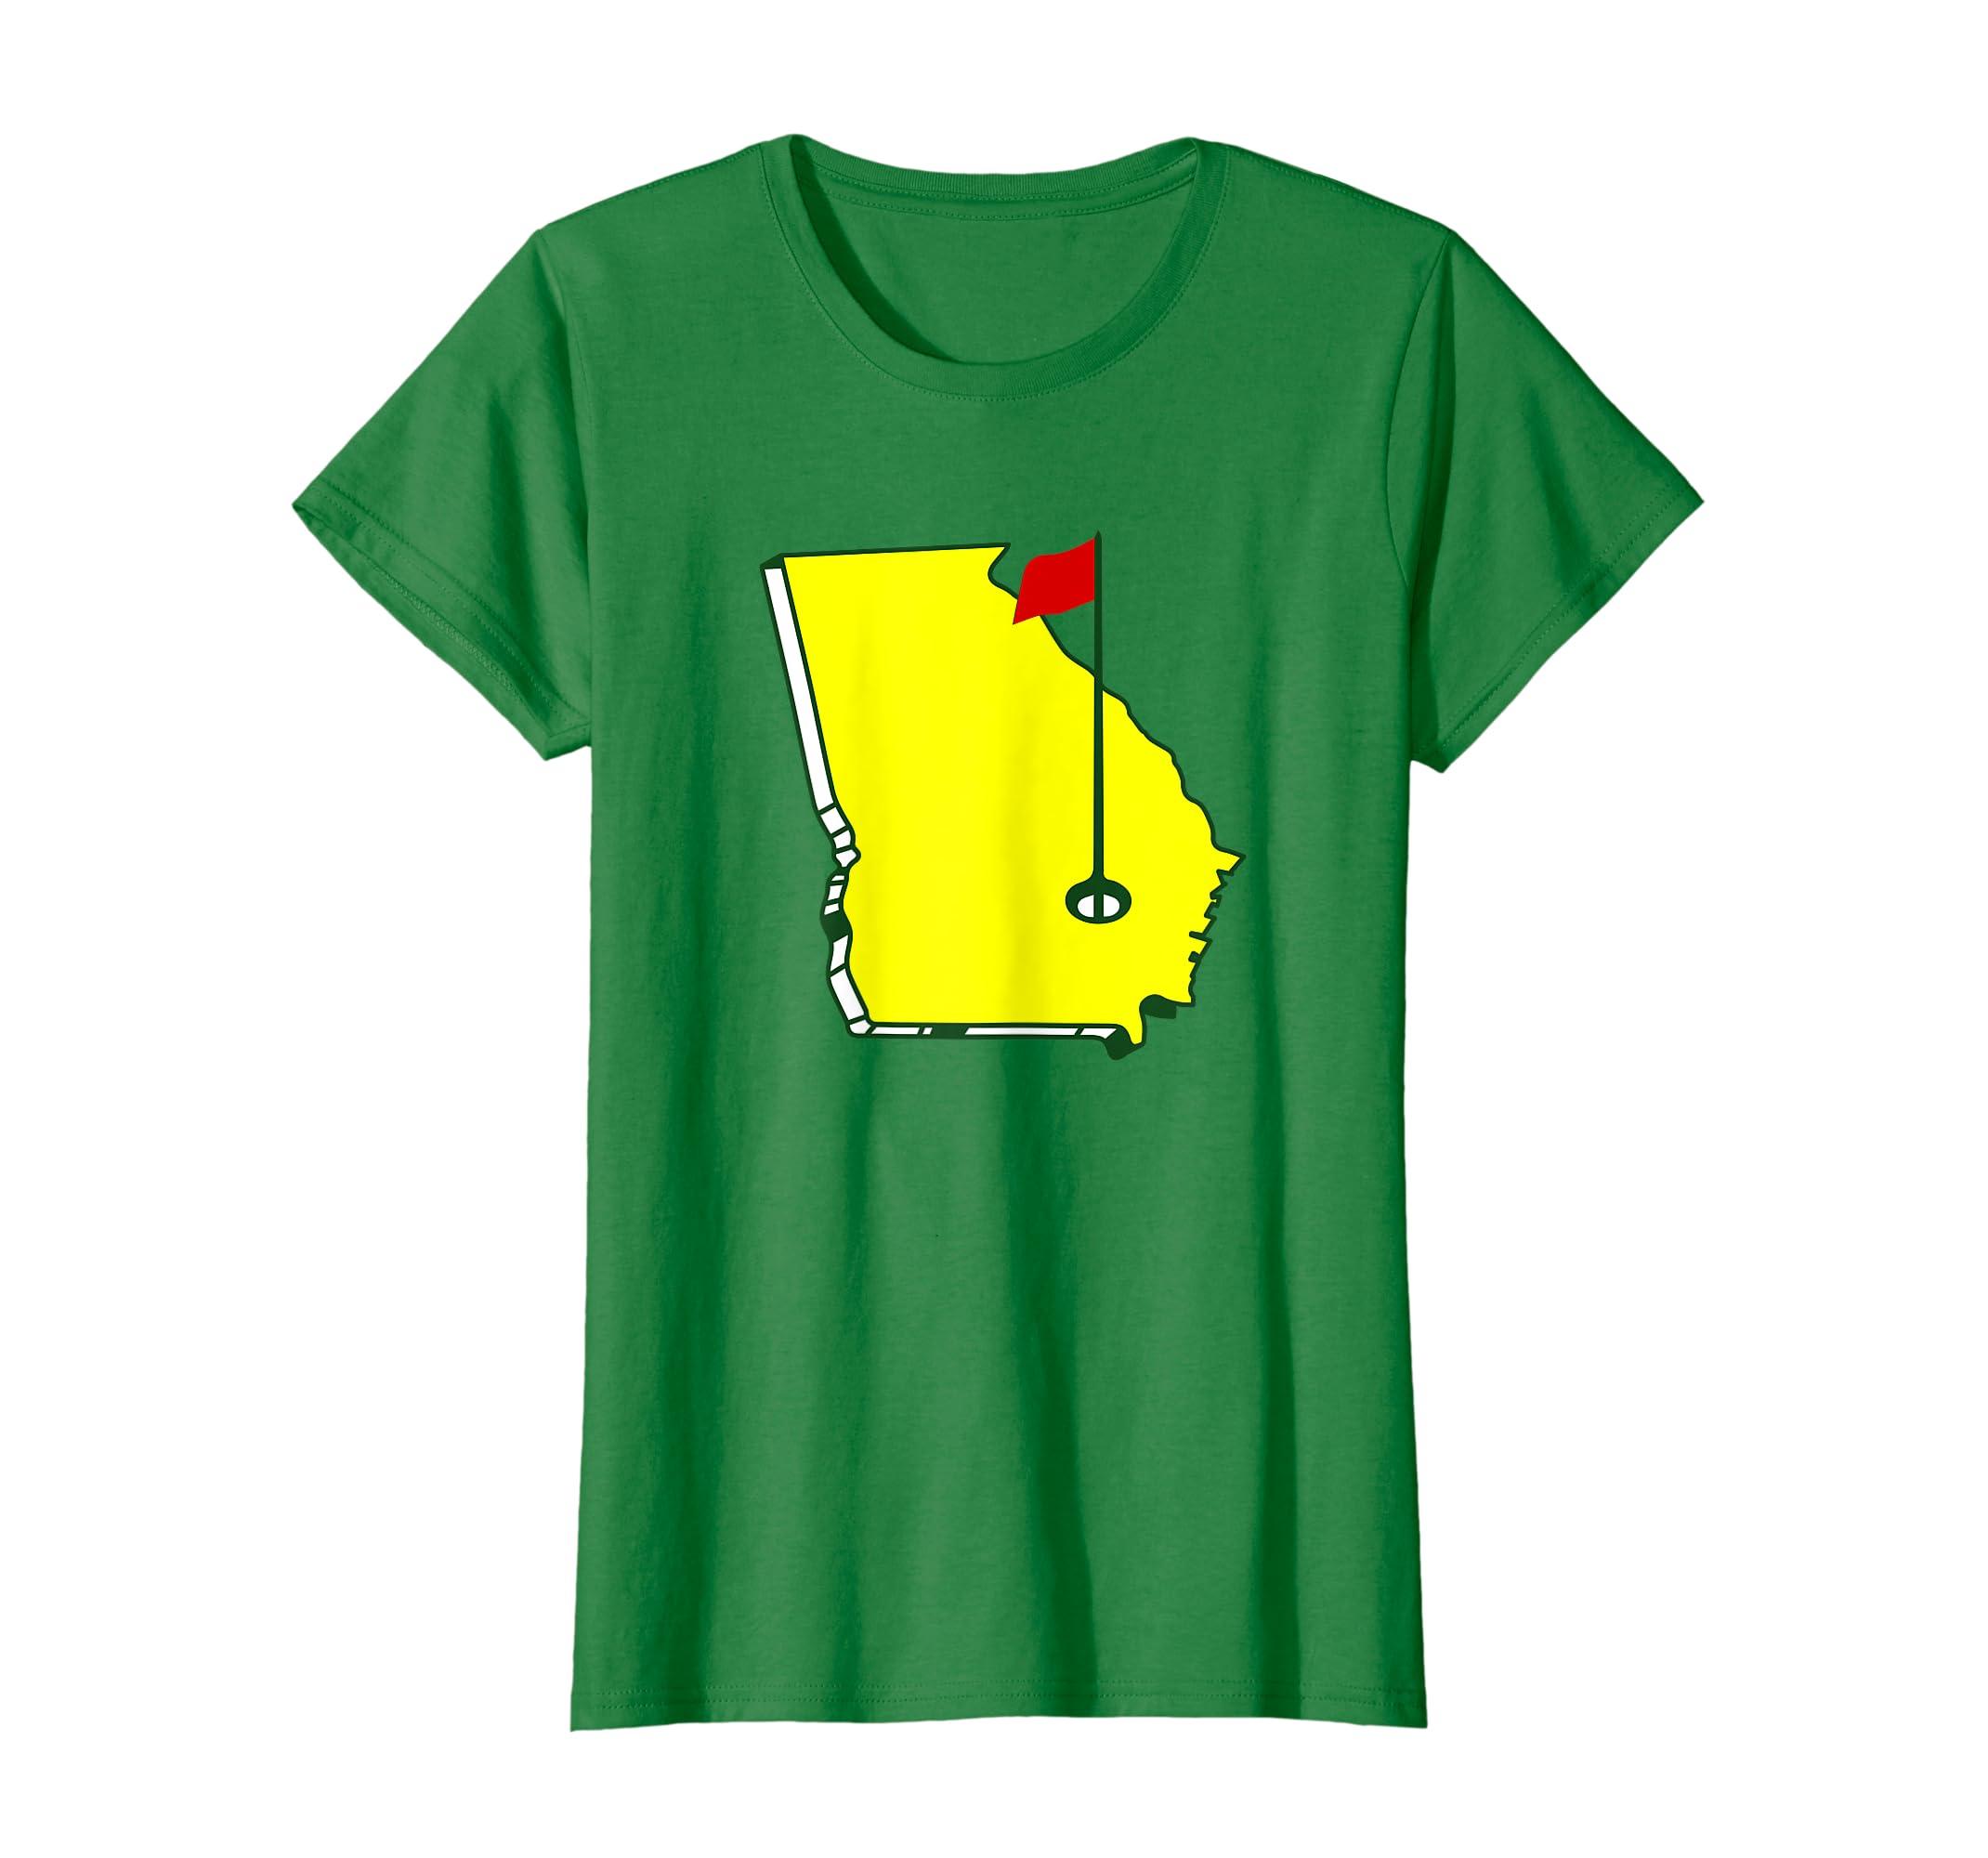 e097970b Amazon.com: Master Golf T-Shirt Georgia State: Clothing